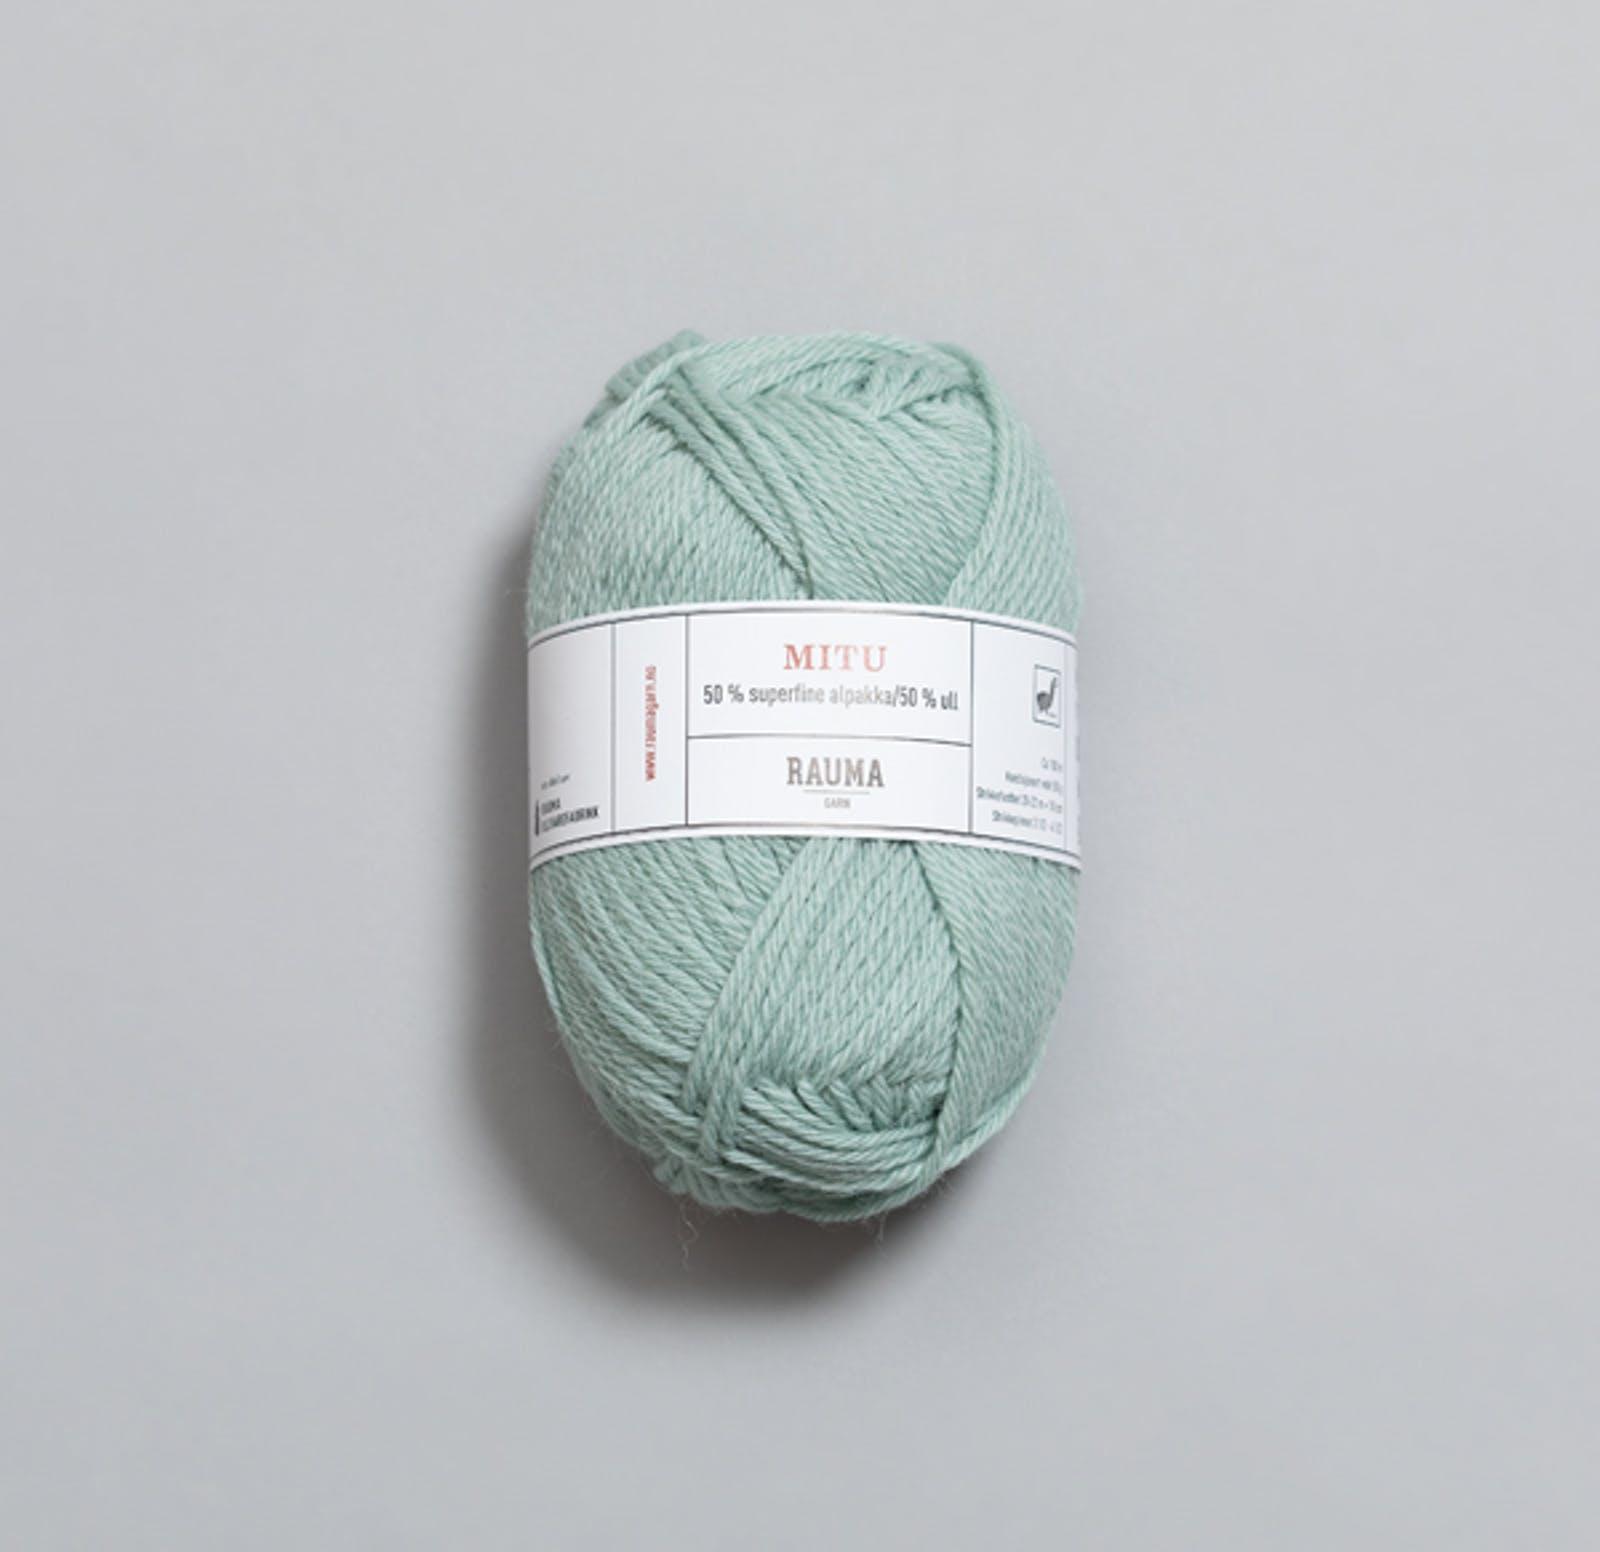 0063 Lys gråbla - MITU